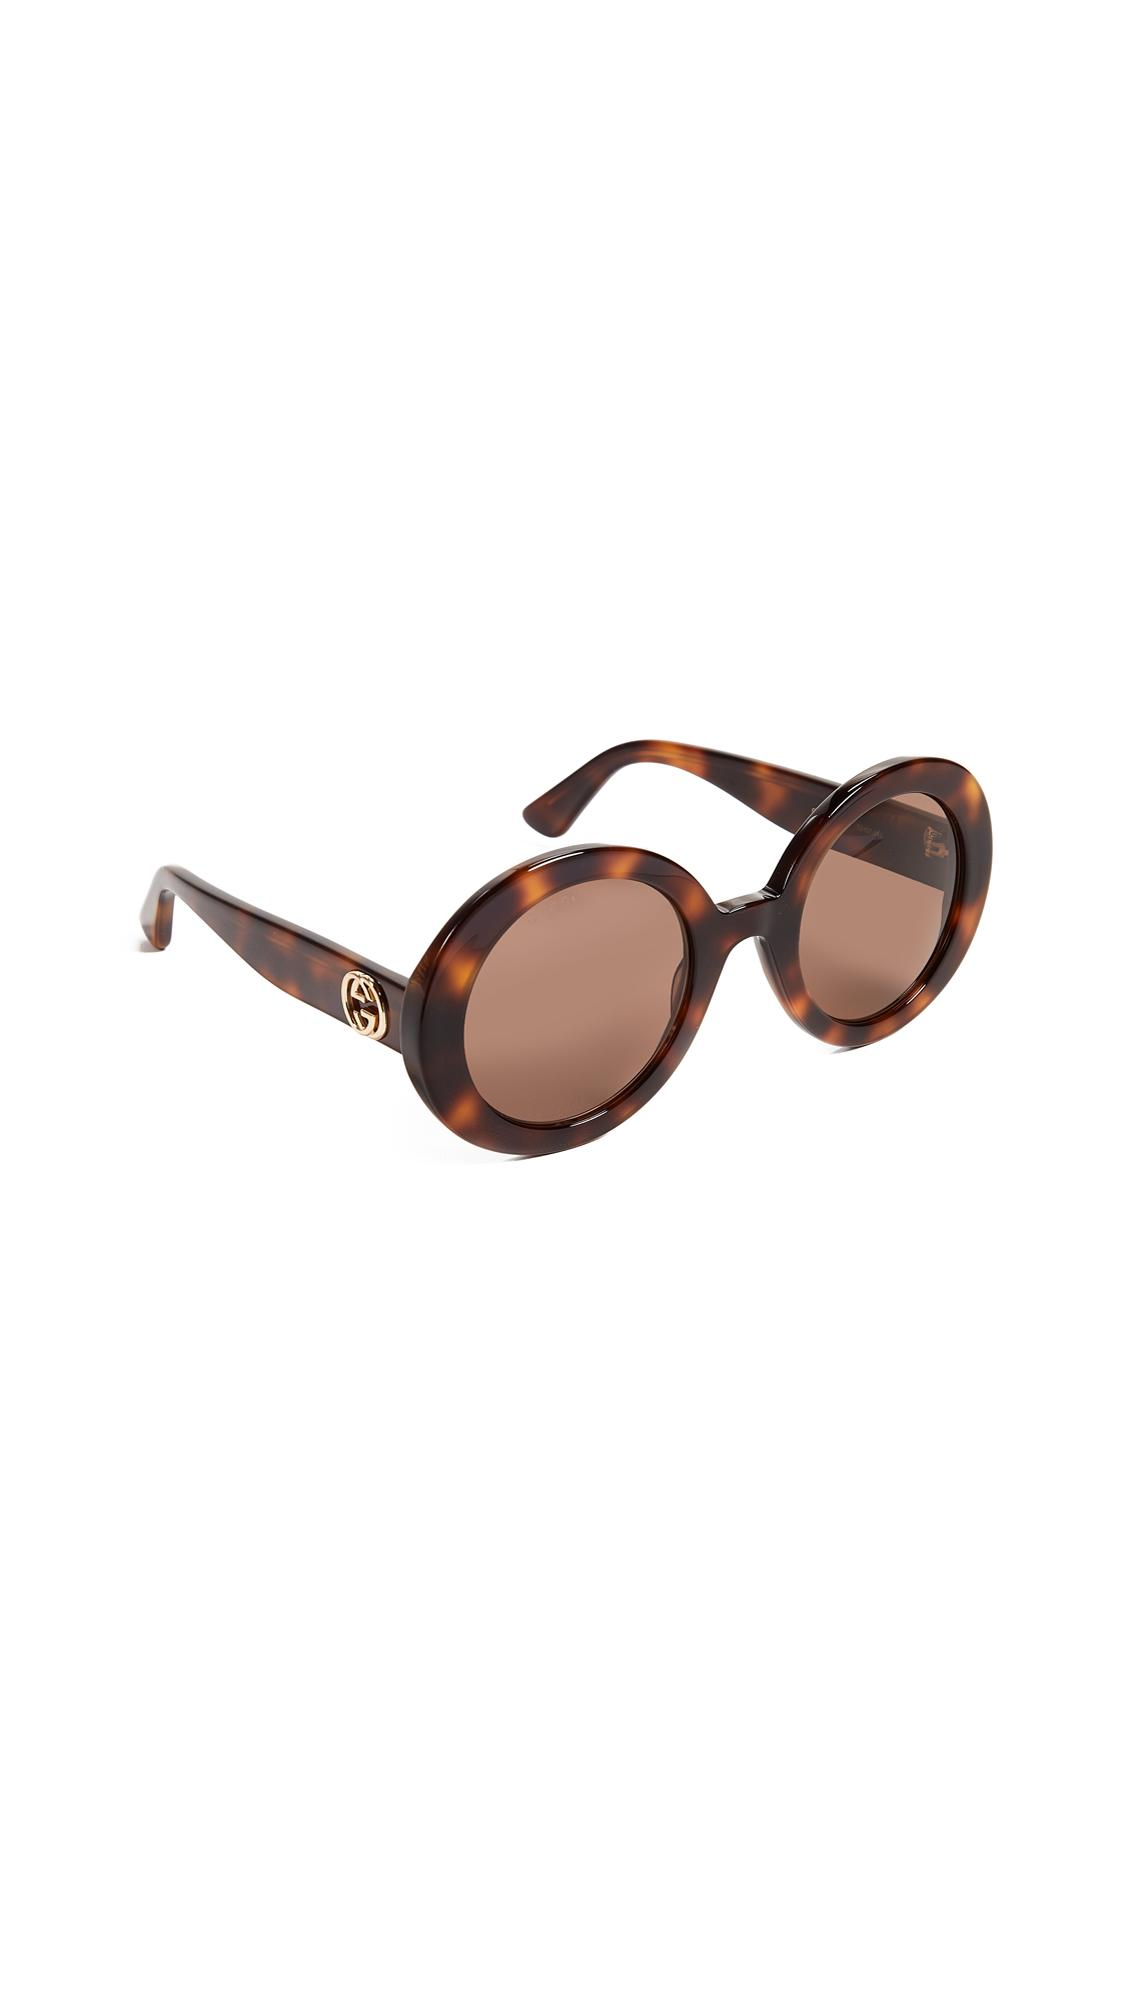 Gucci Gg Oval Sunglasses In Havana/Brown